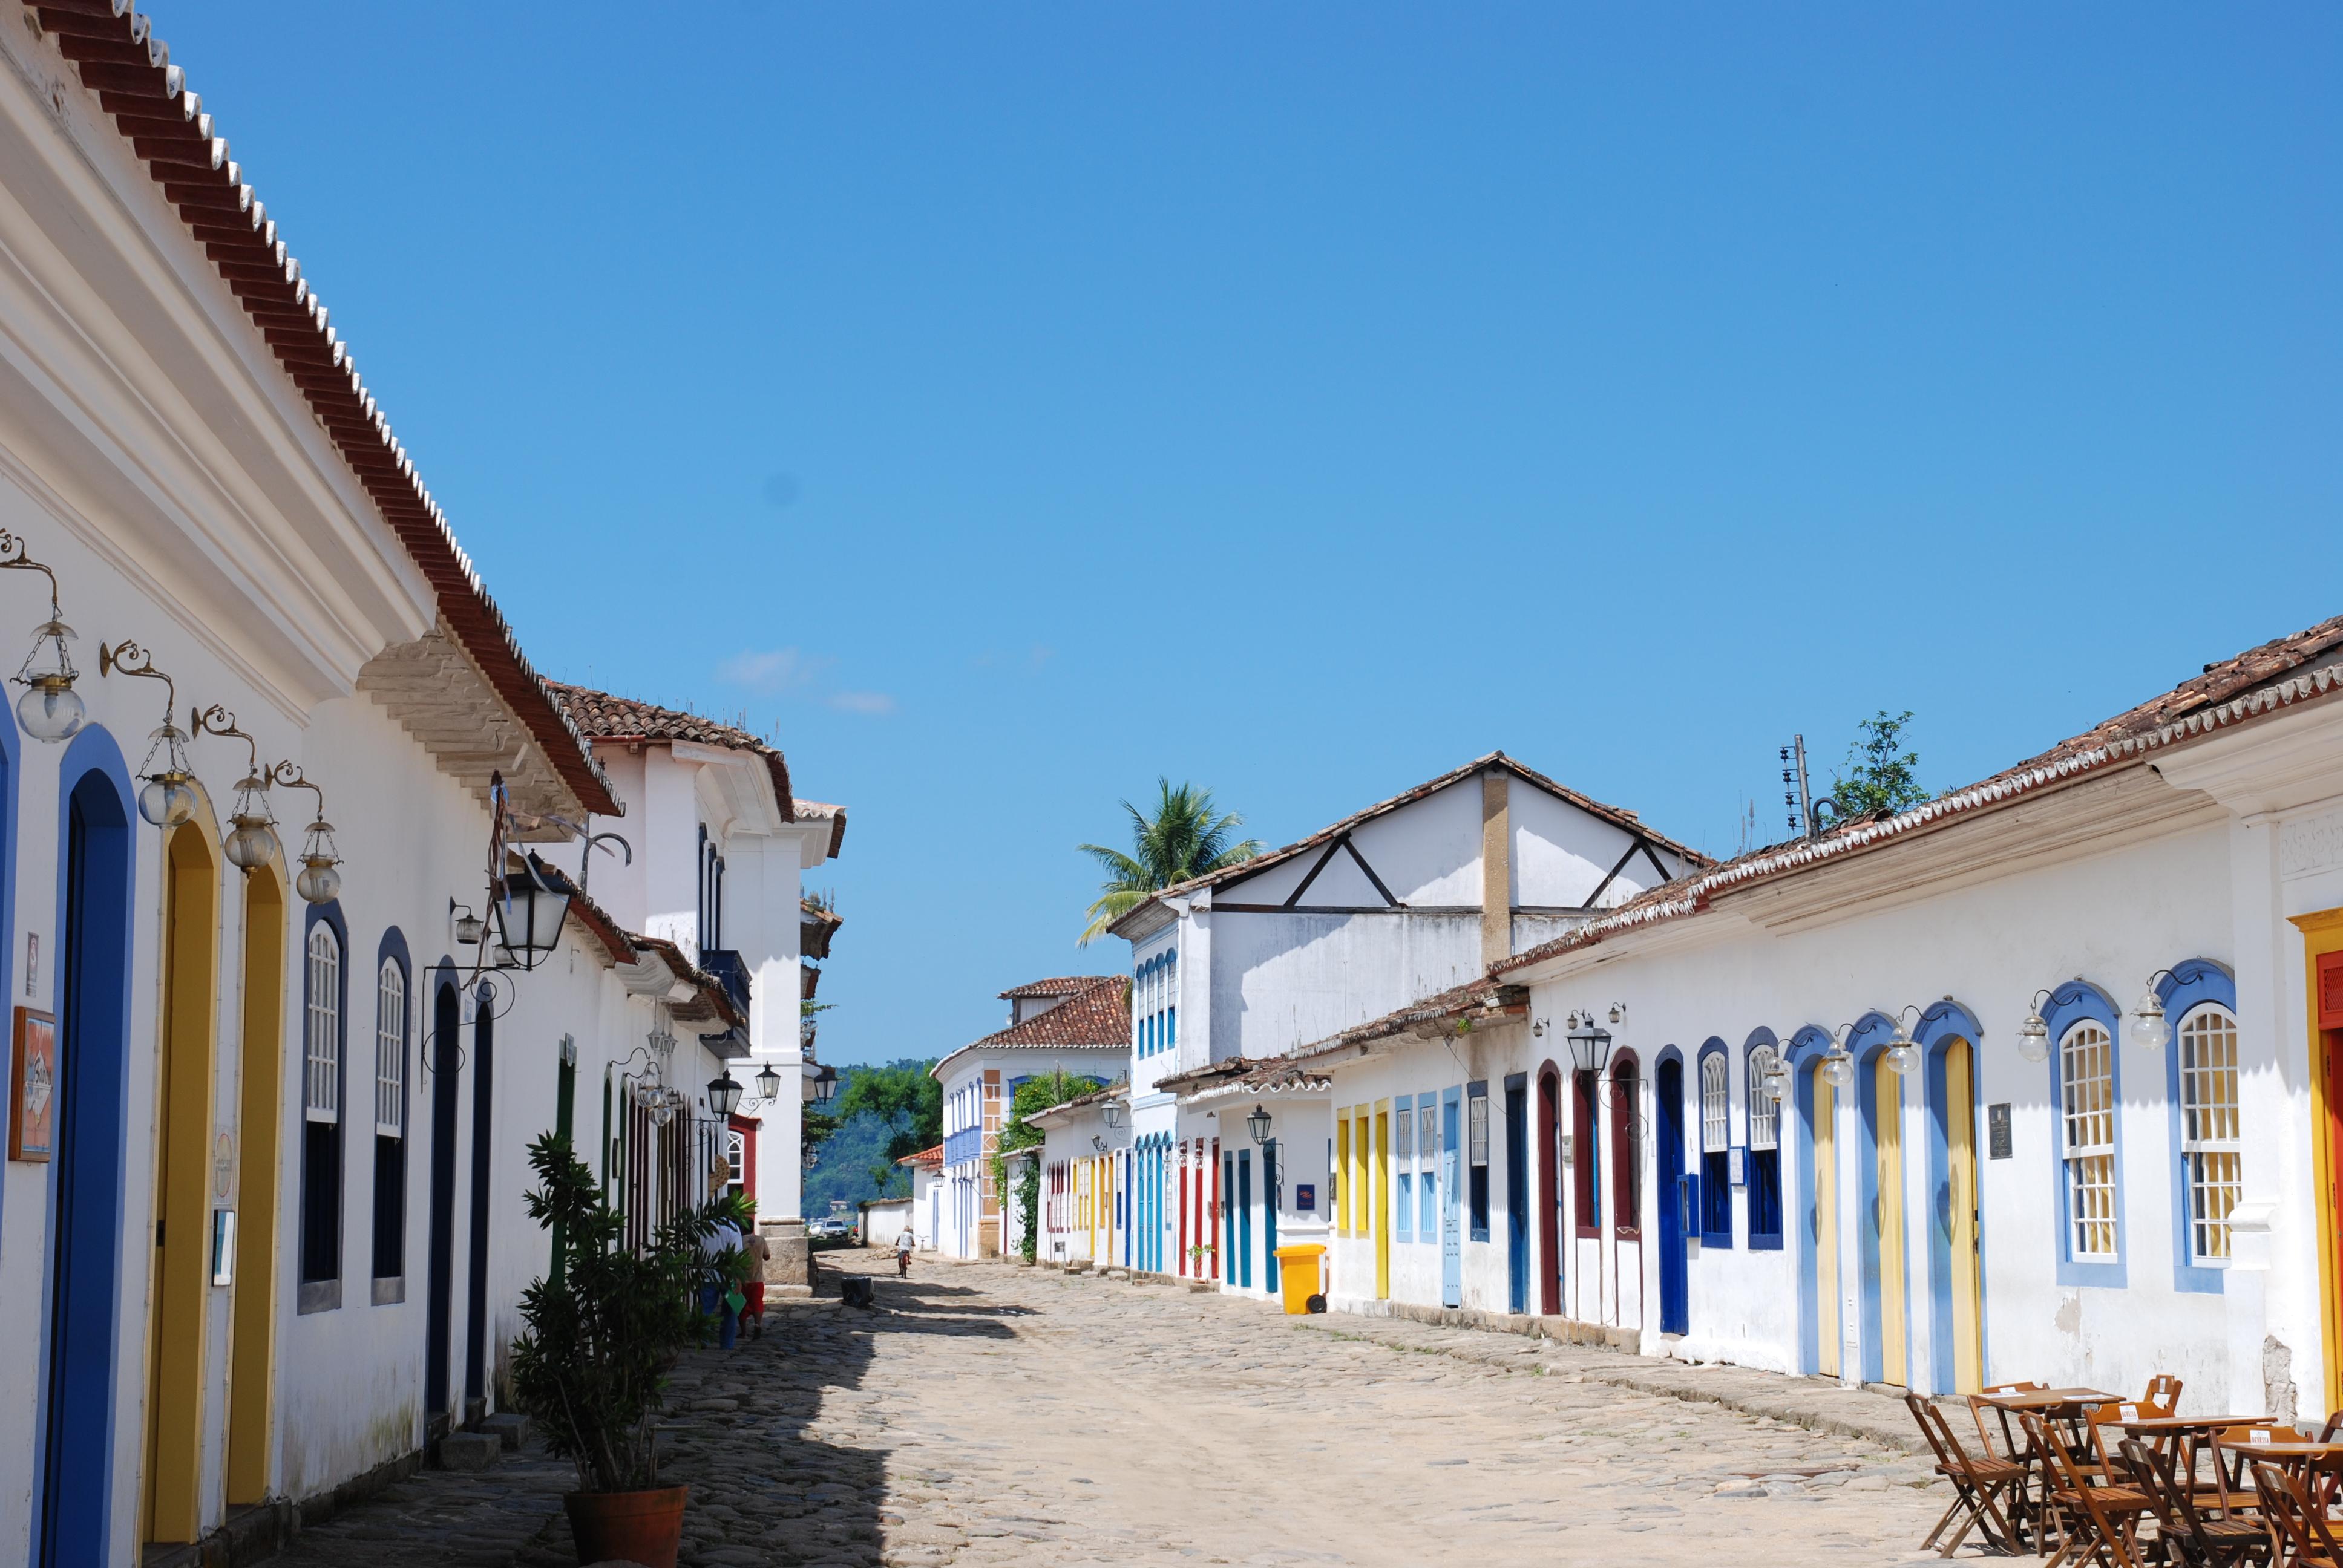 Paraty Brazil  city photos gallery : Ficheiro:Brazil paraty wide street – Wikipédia, a enciclopédia ...